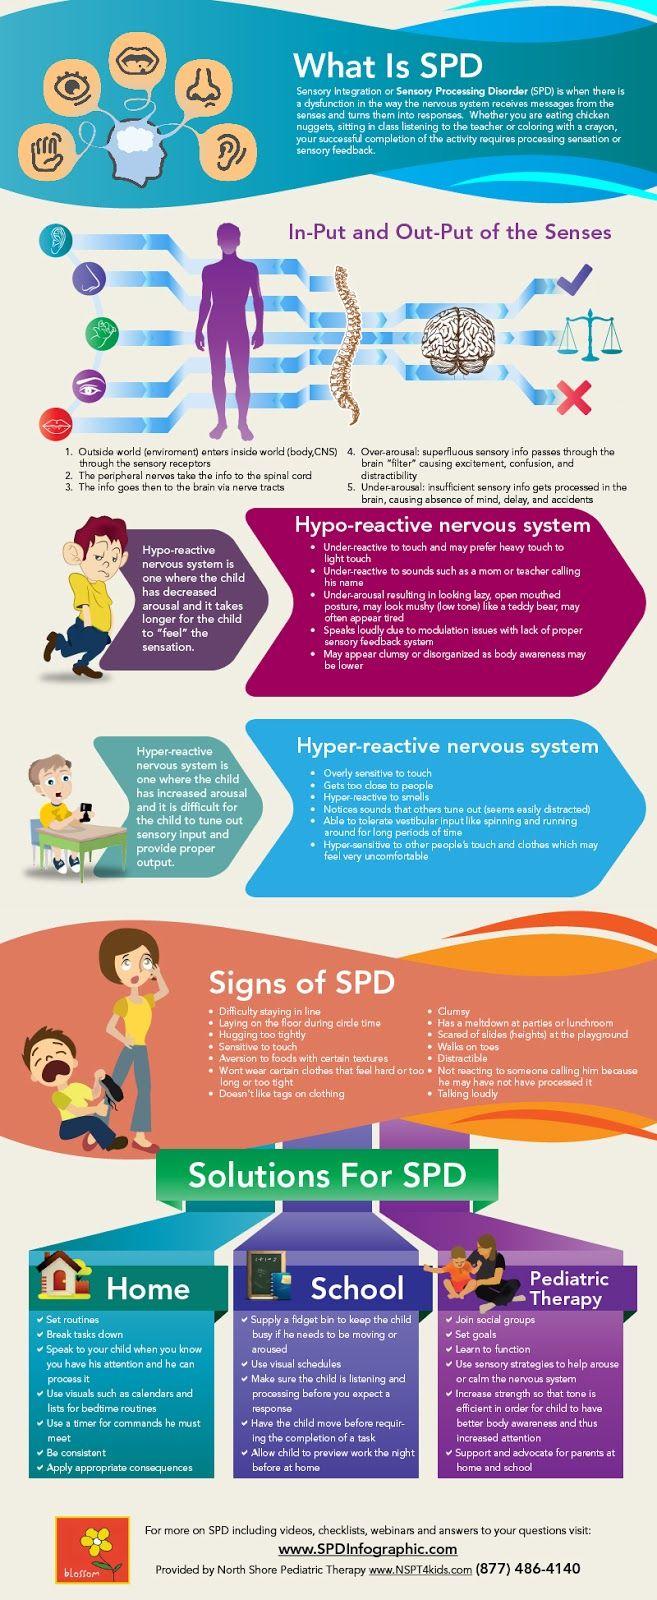 The Sensory Diet - Treatment for Sensory Integration Disorder